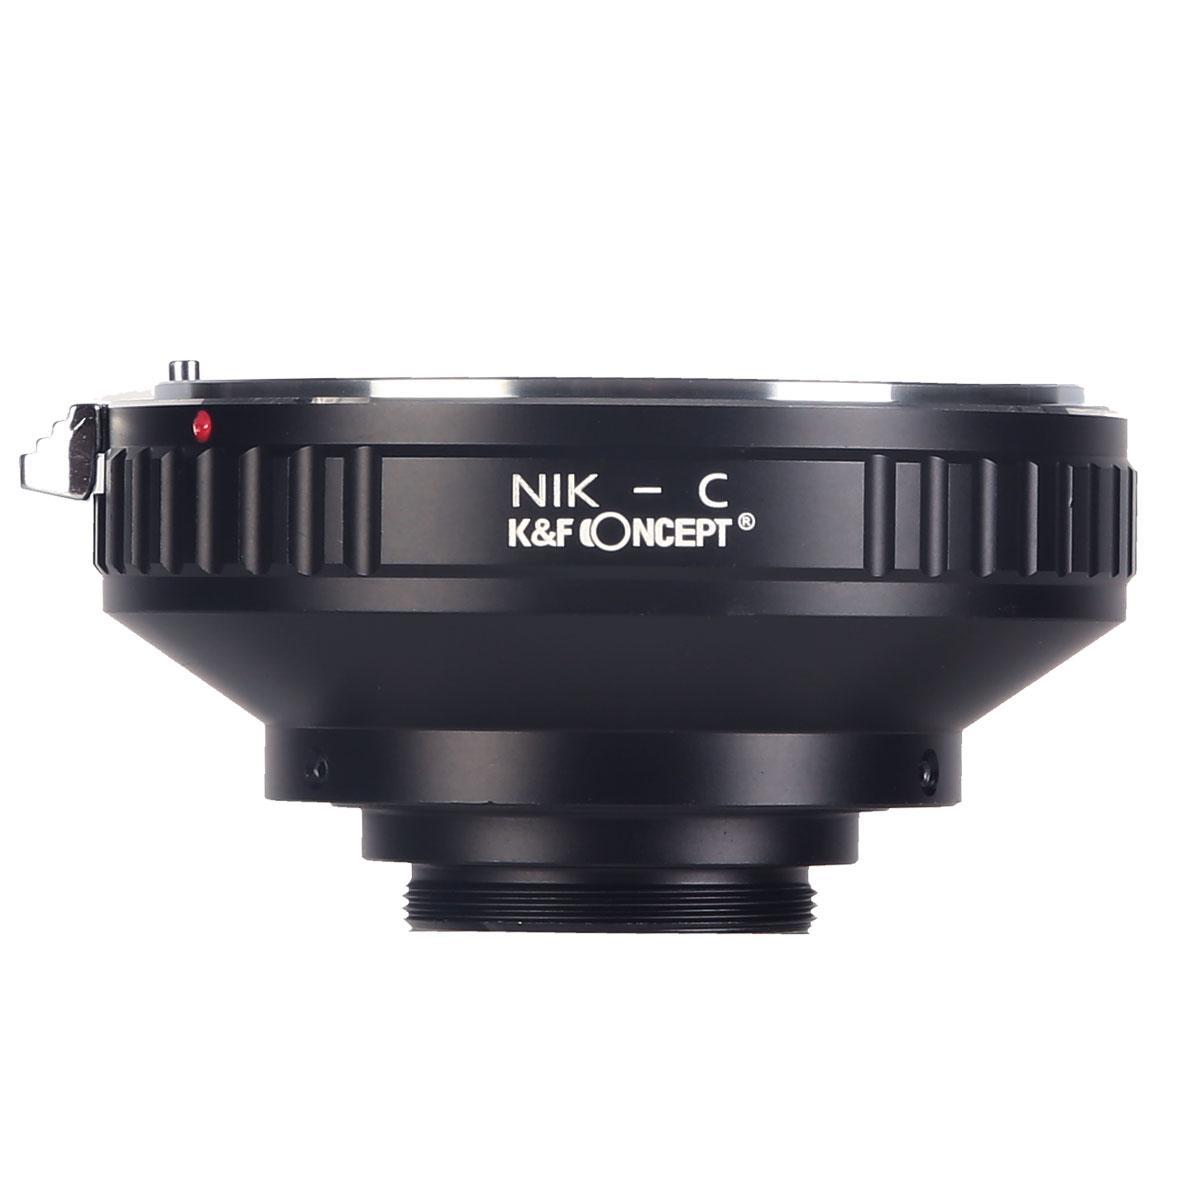 K&F M11231 Bague Adaptation Objectif Nikon F vers C Mount Appareil Photo